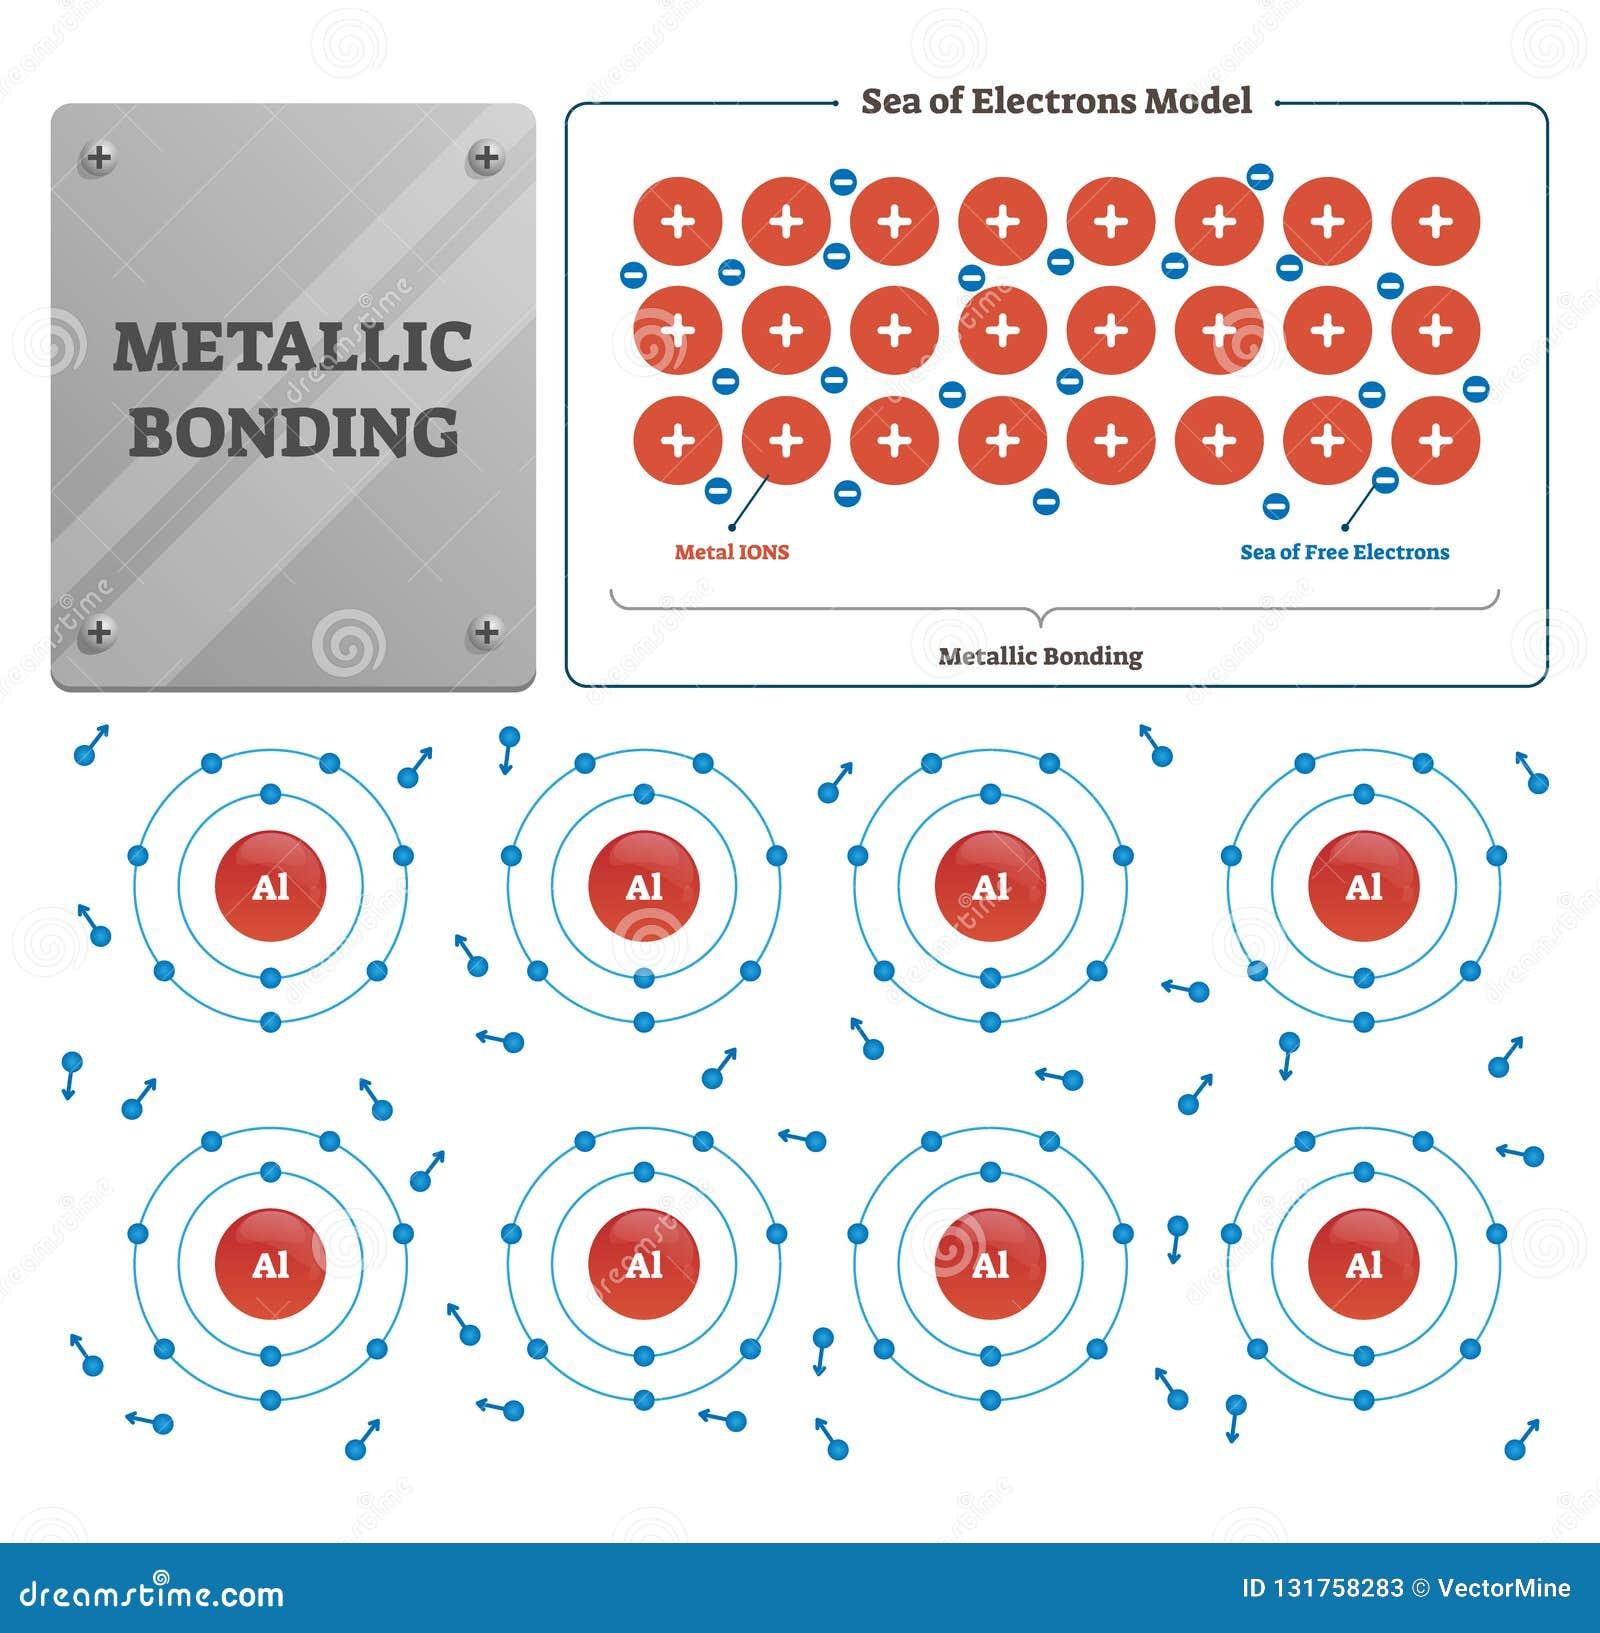 Metallic Bonding Vector Illustration  Labeled Metal Ions